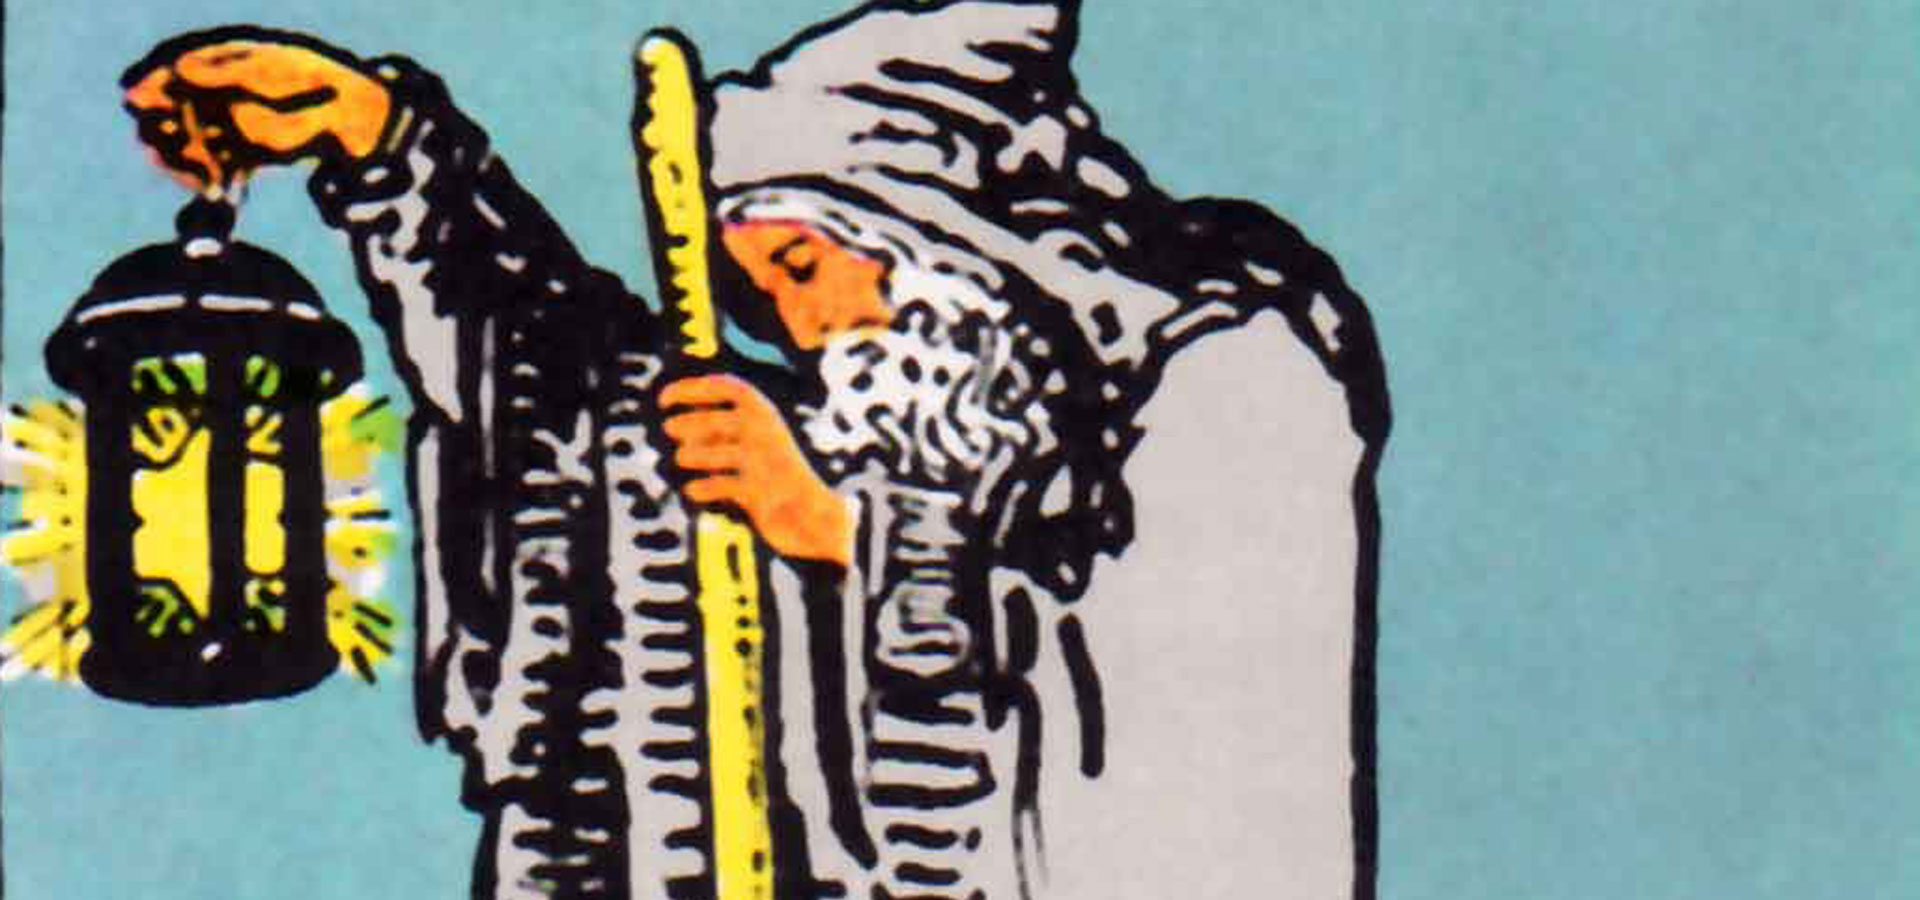 tarot stor arkana 09 - Få lagt tarotkort online af ekspert